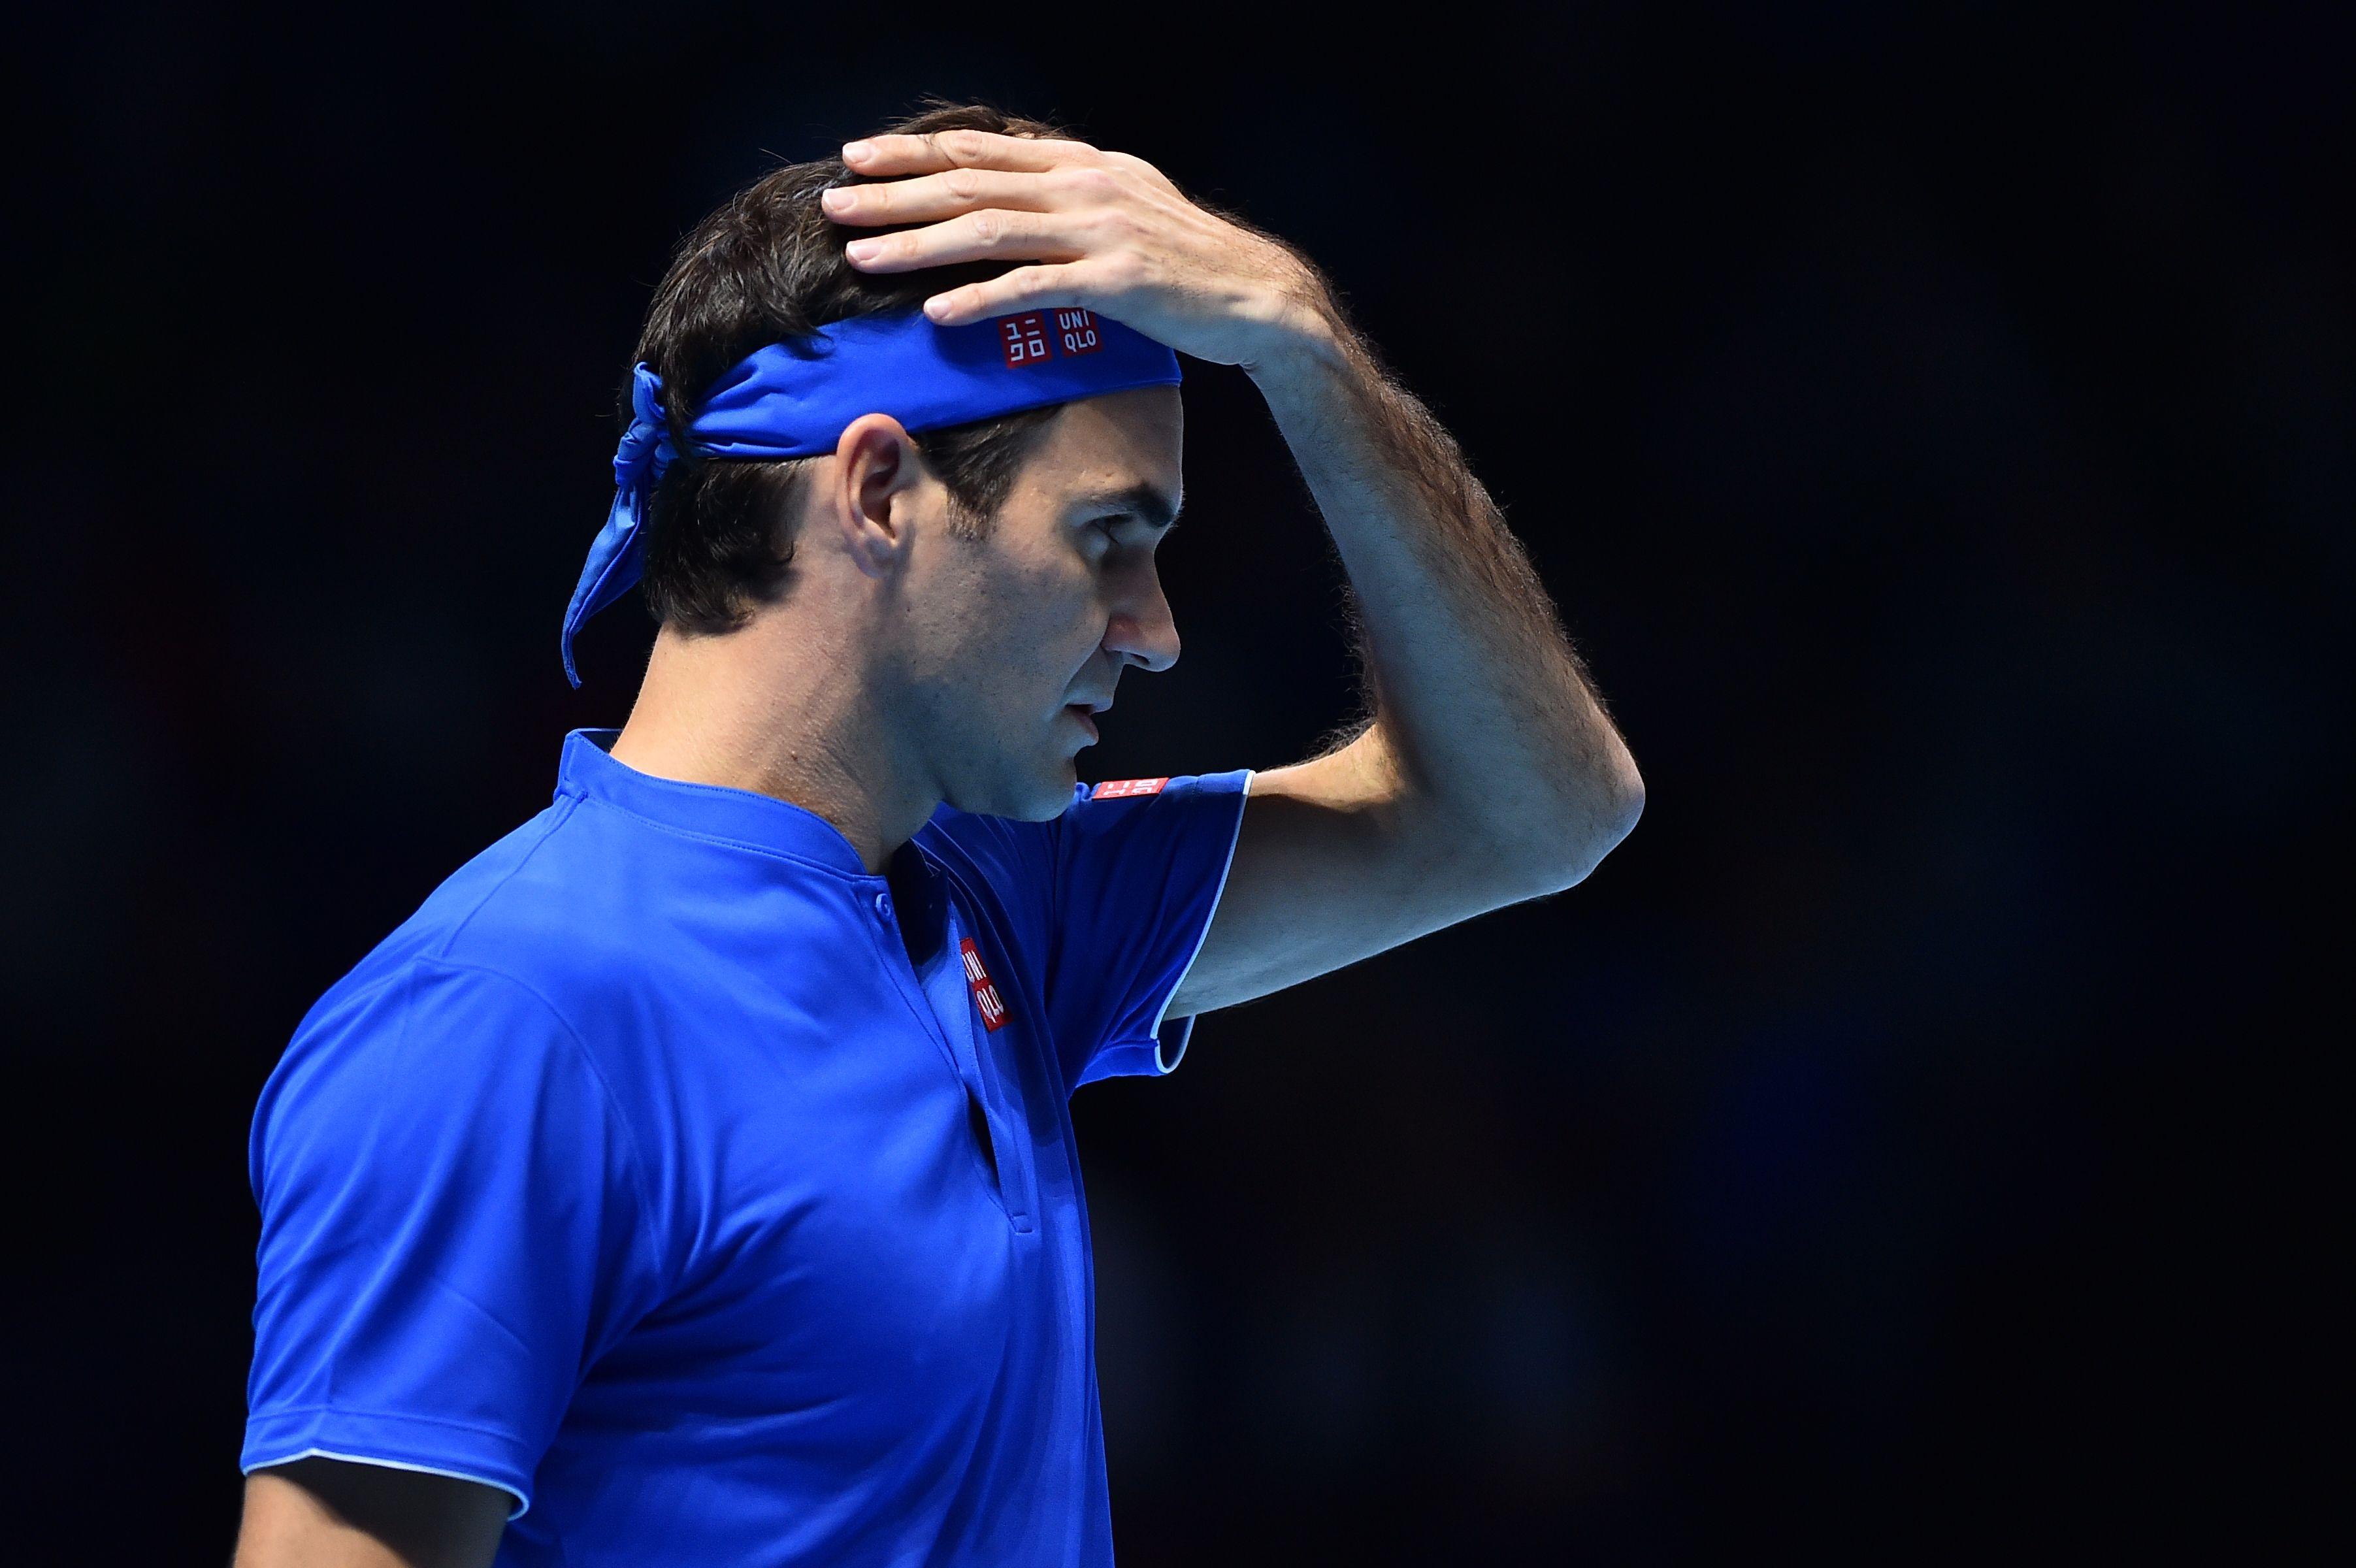 Federer lost to Kei Nishikori on Sunday